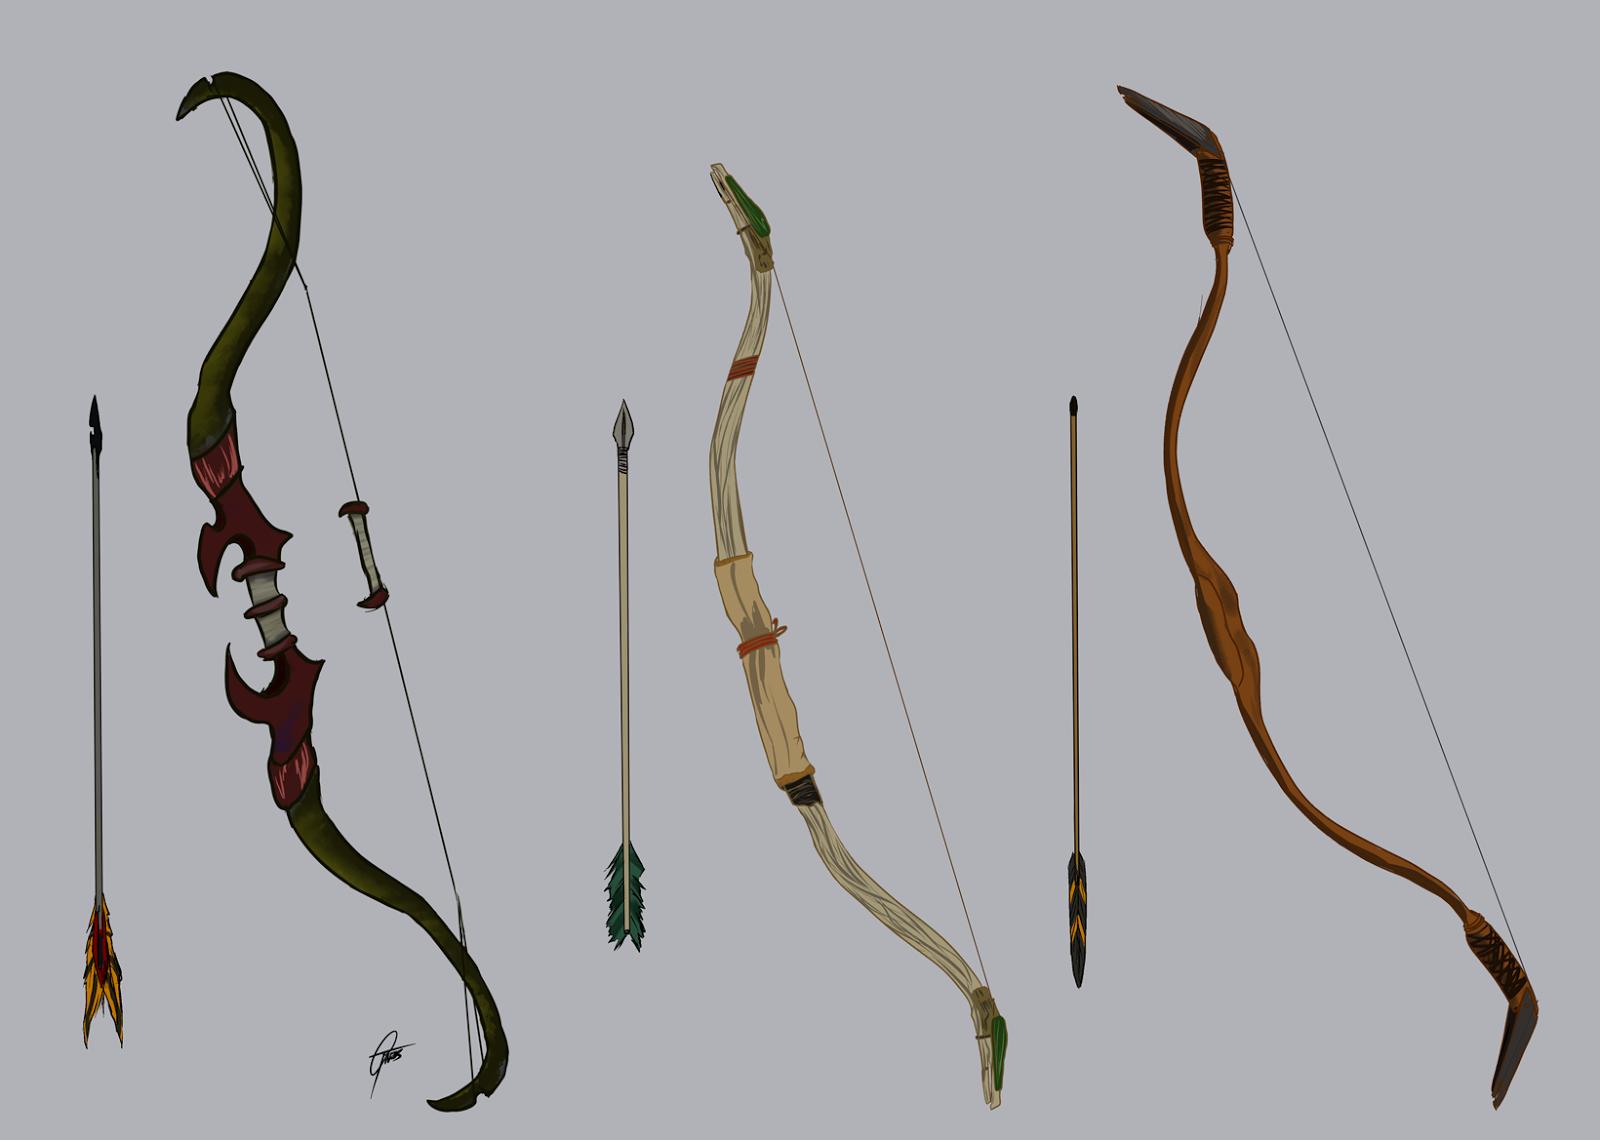 Petitecreme :: Illustrator and Designer: Bow and arrow designs